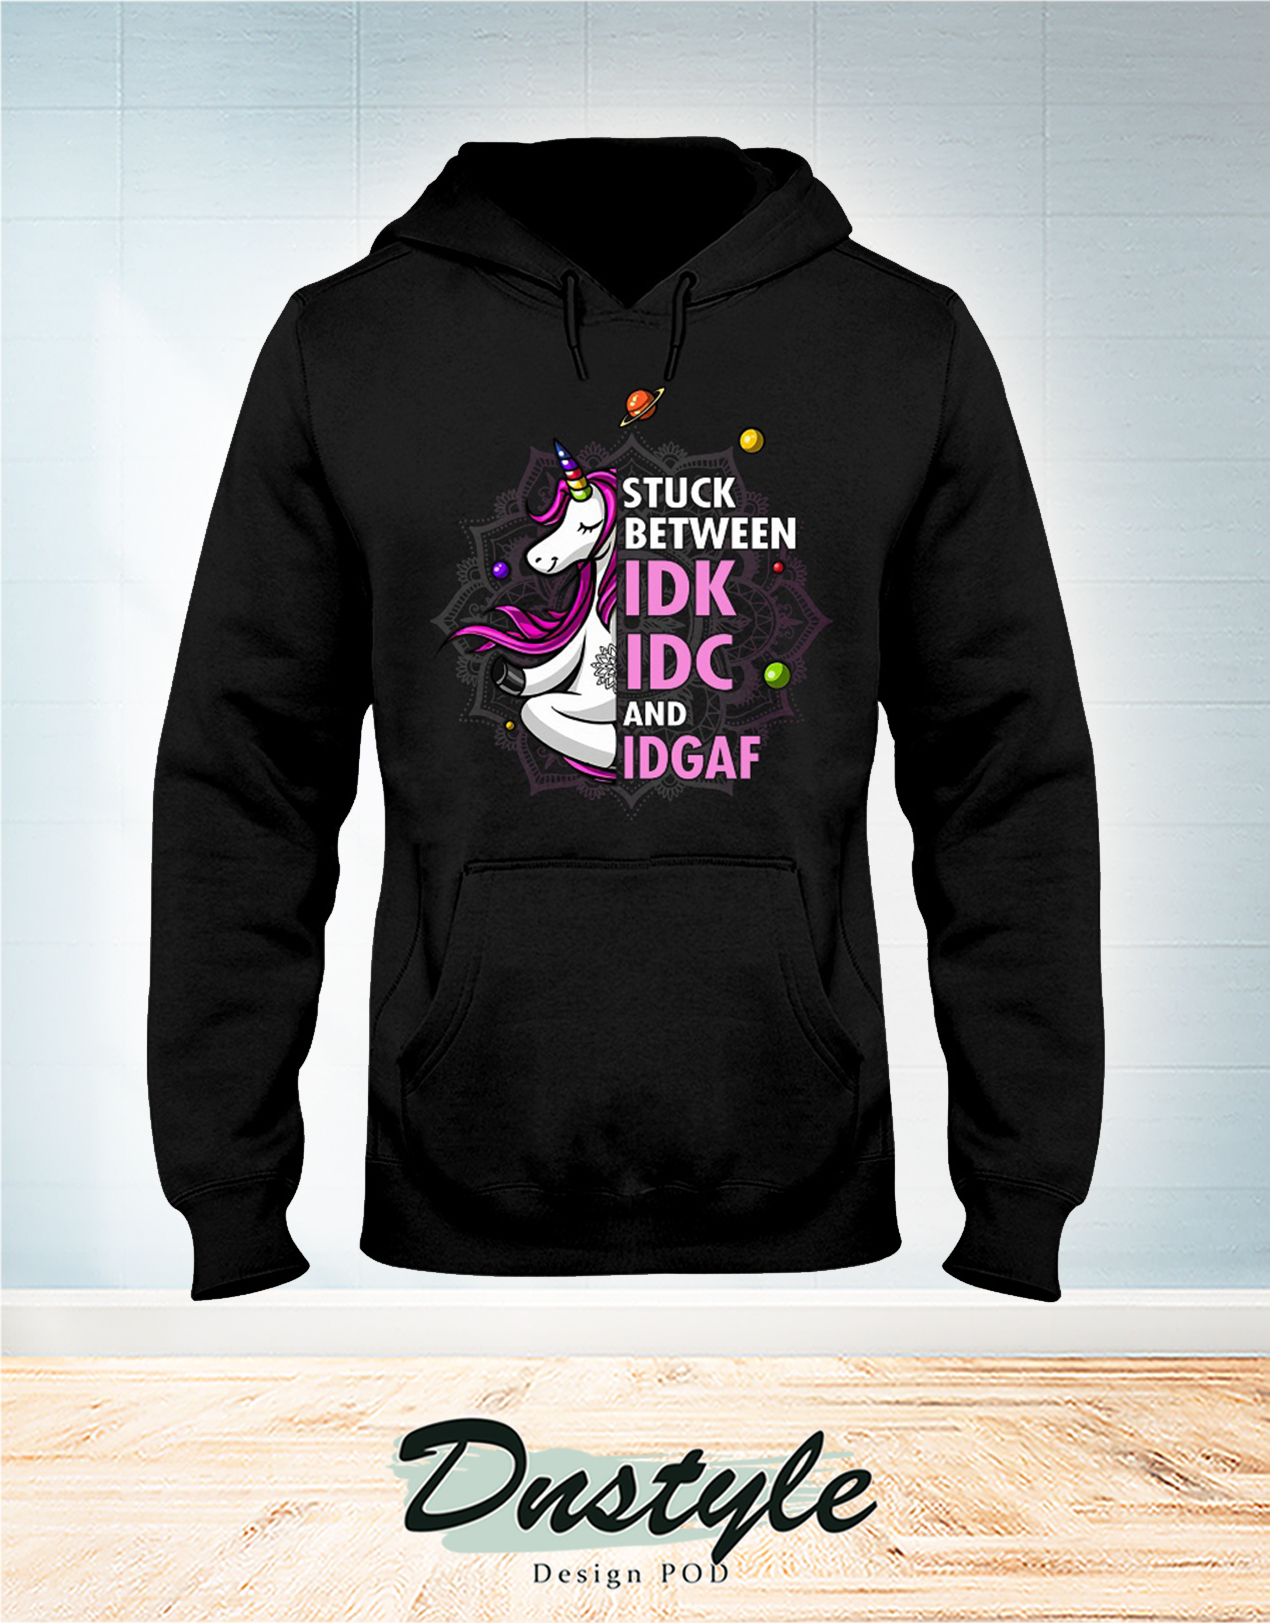 Unicorns Stuck Between IDK IDC And IDGAF hoodie